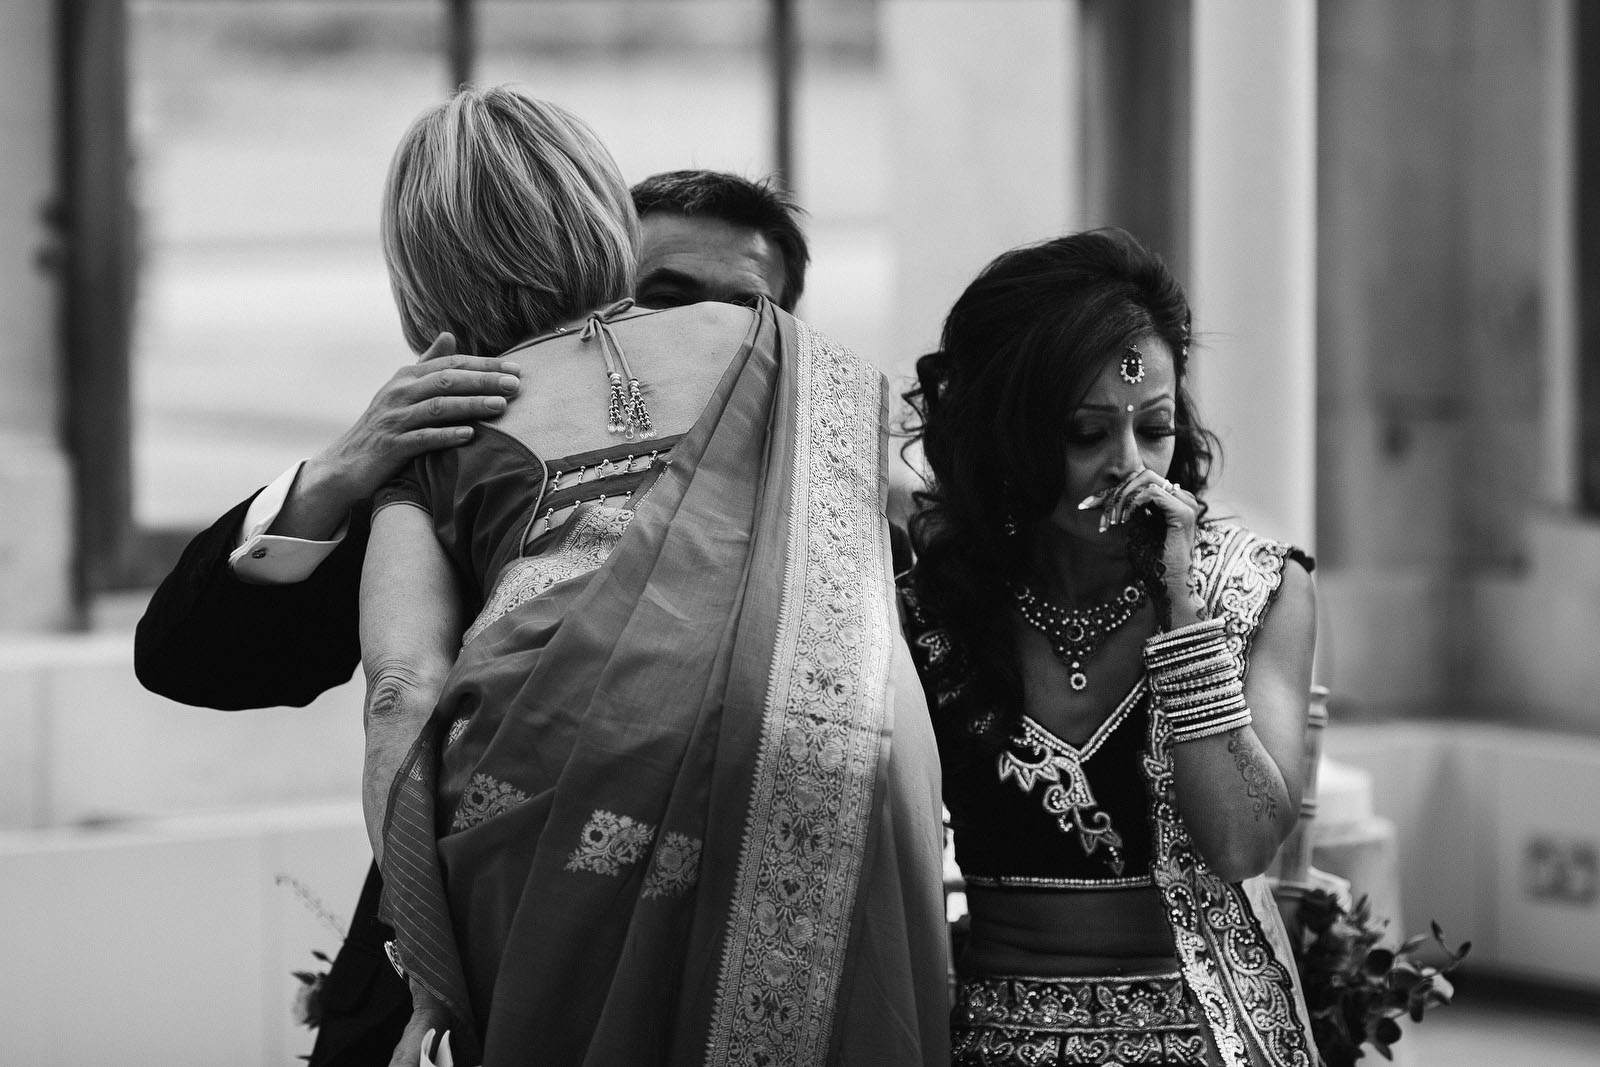 reportage wedding photography1